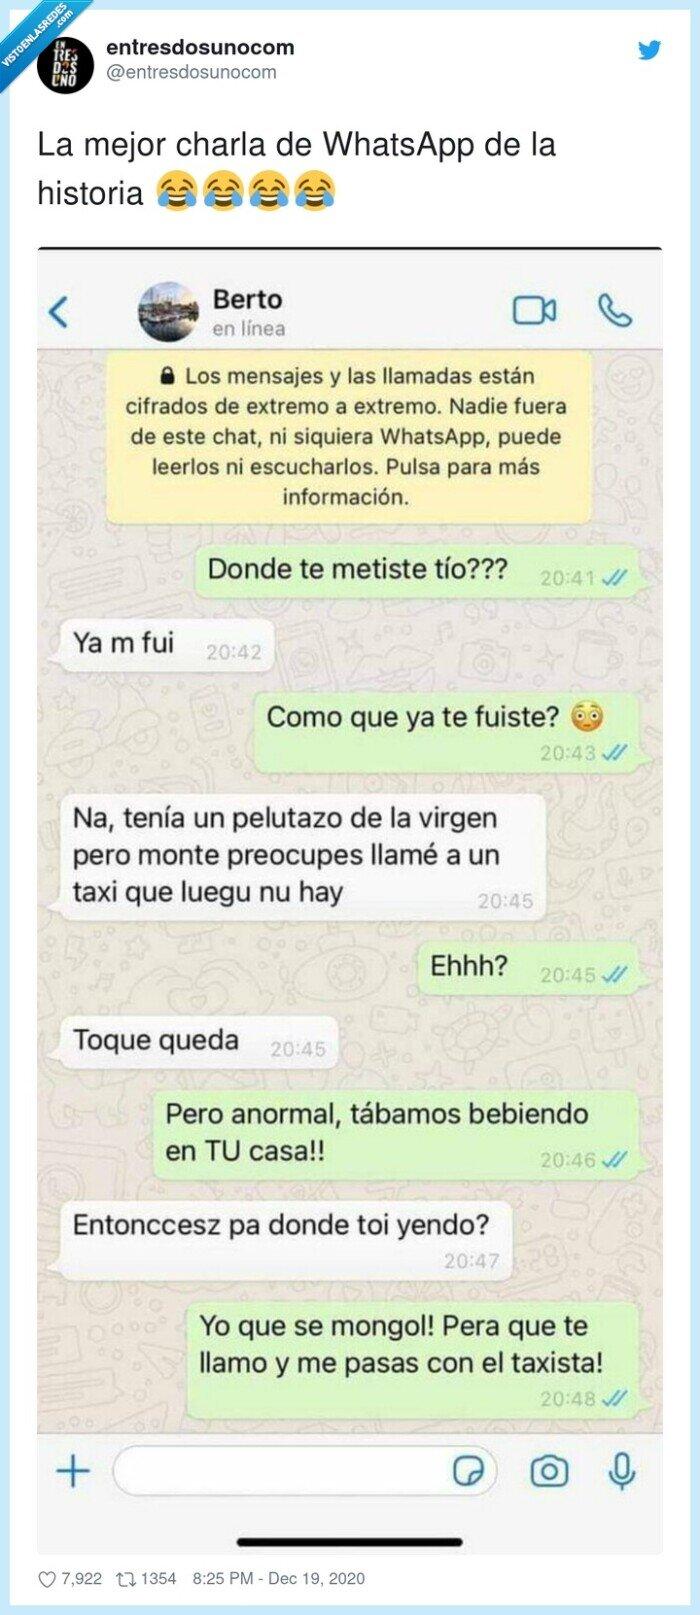 borracho,charla,historia,mejor,taxi,whatsapp